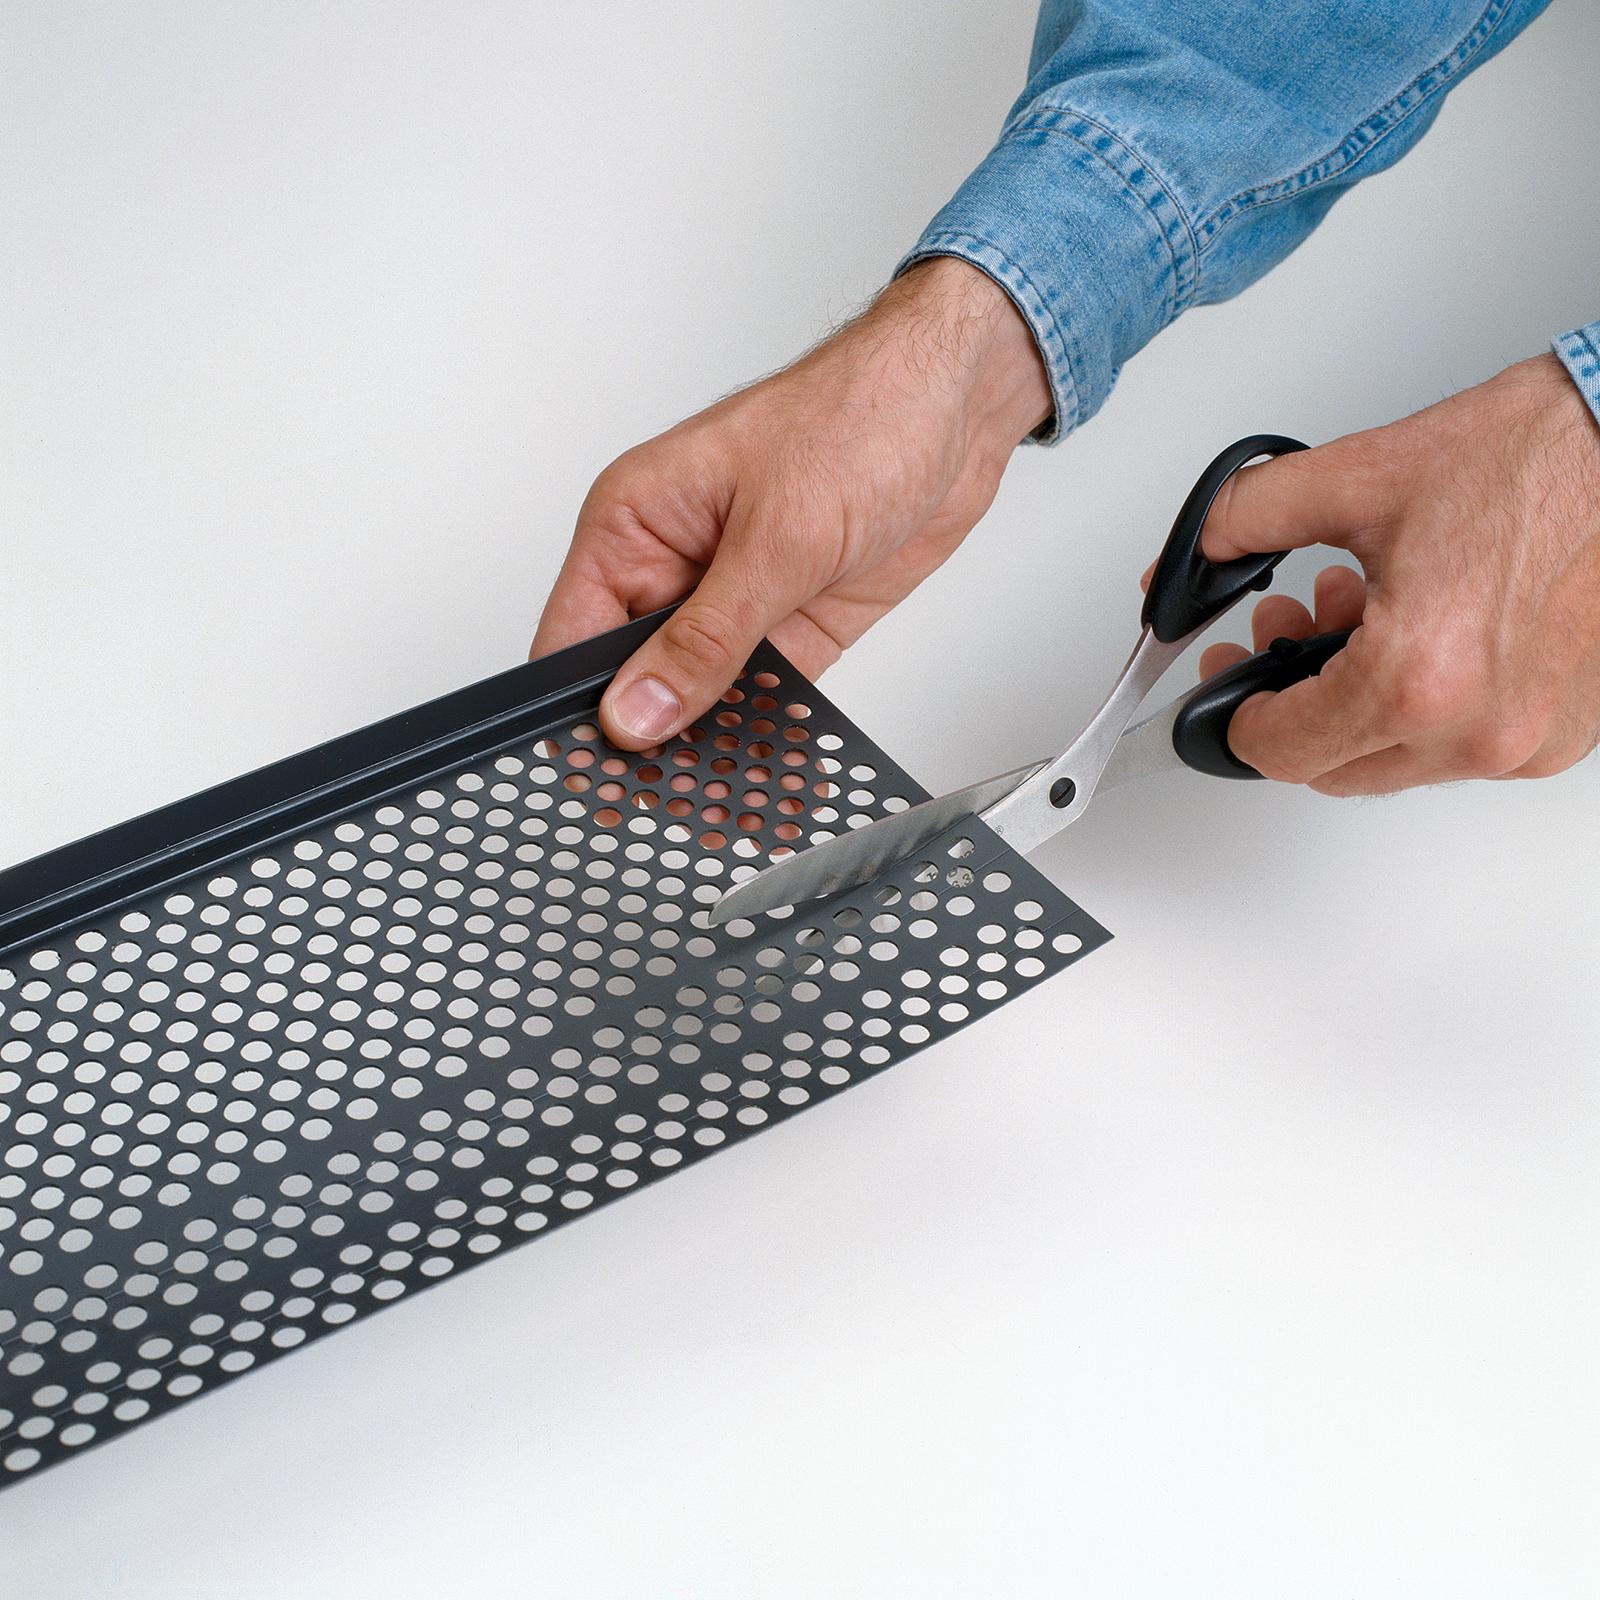 marley poly net laubstop laubschutz f r dachrinne. Black Bedroom Furniture Sets. Home Design Ideas